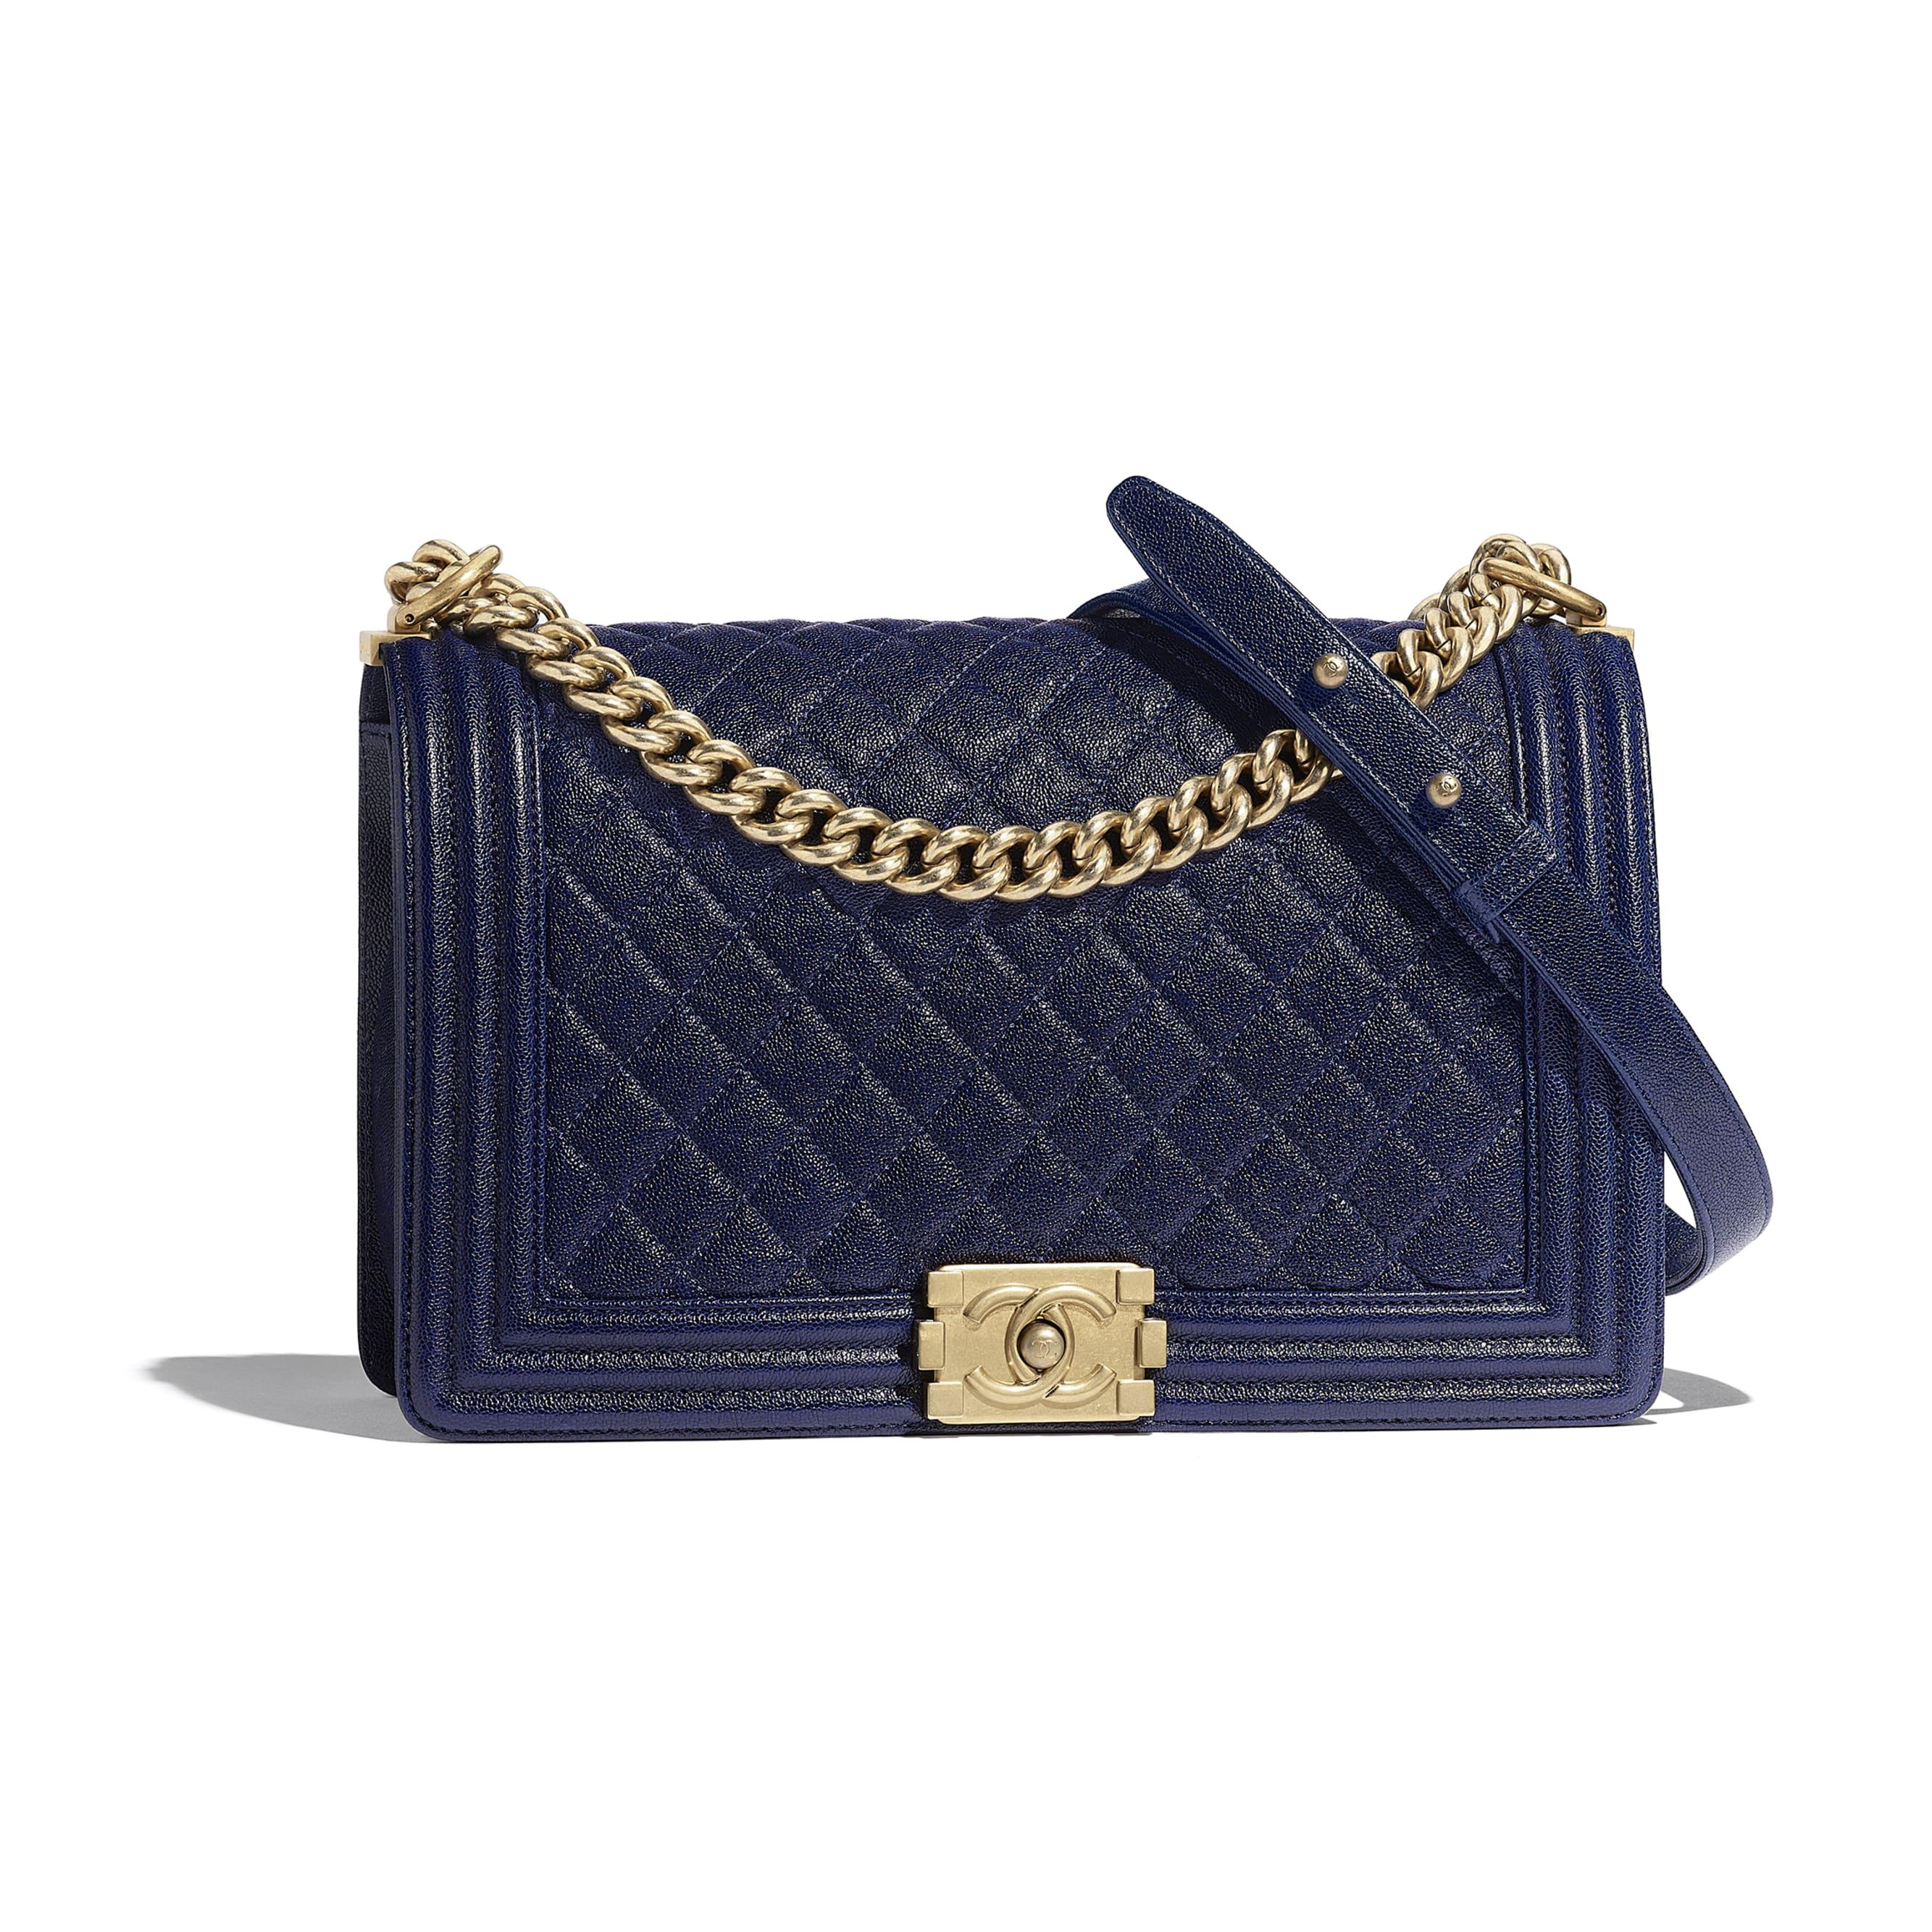 Large BOY CHANEL Handbag - Blue - Grained Calfskin & Gold-Tone Metal - Default view - see standard sized version